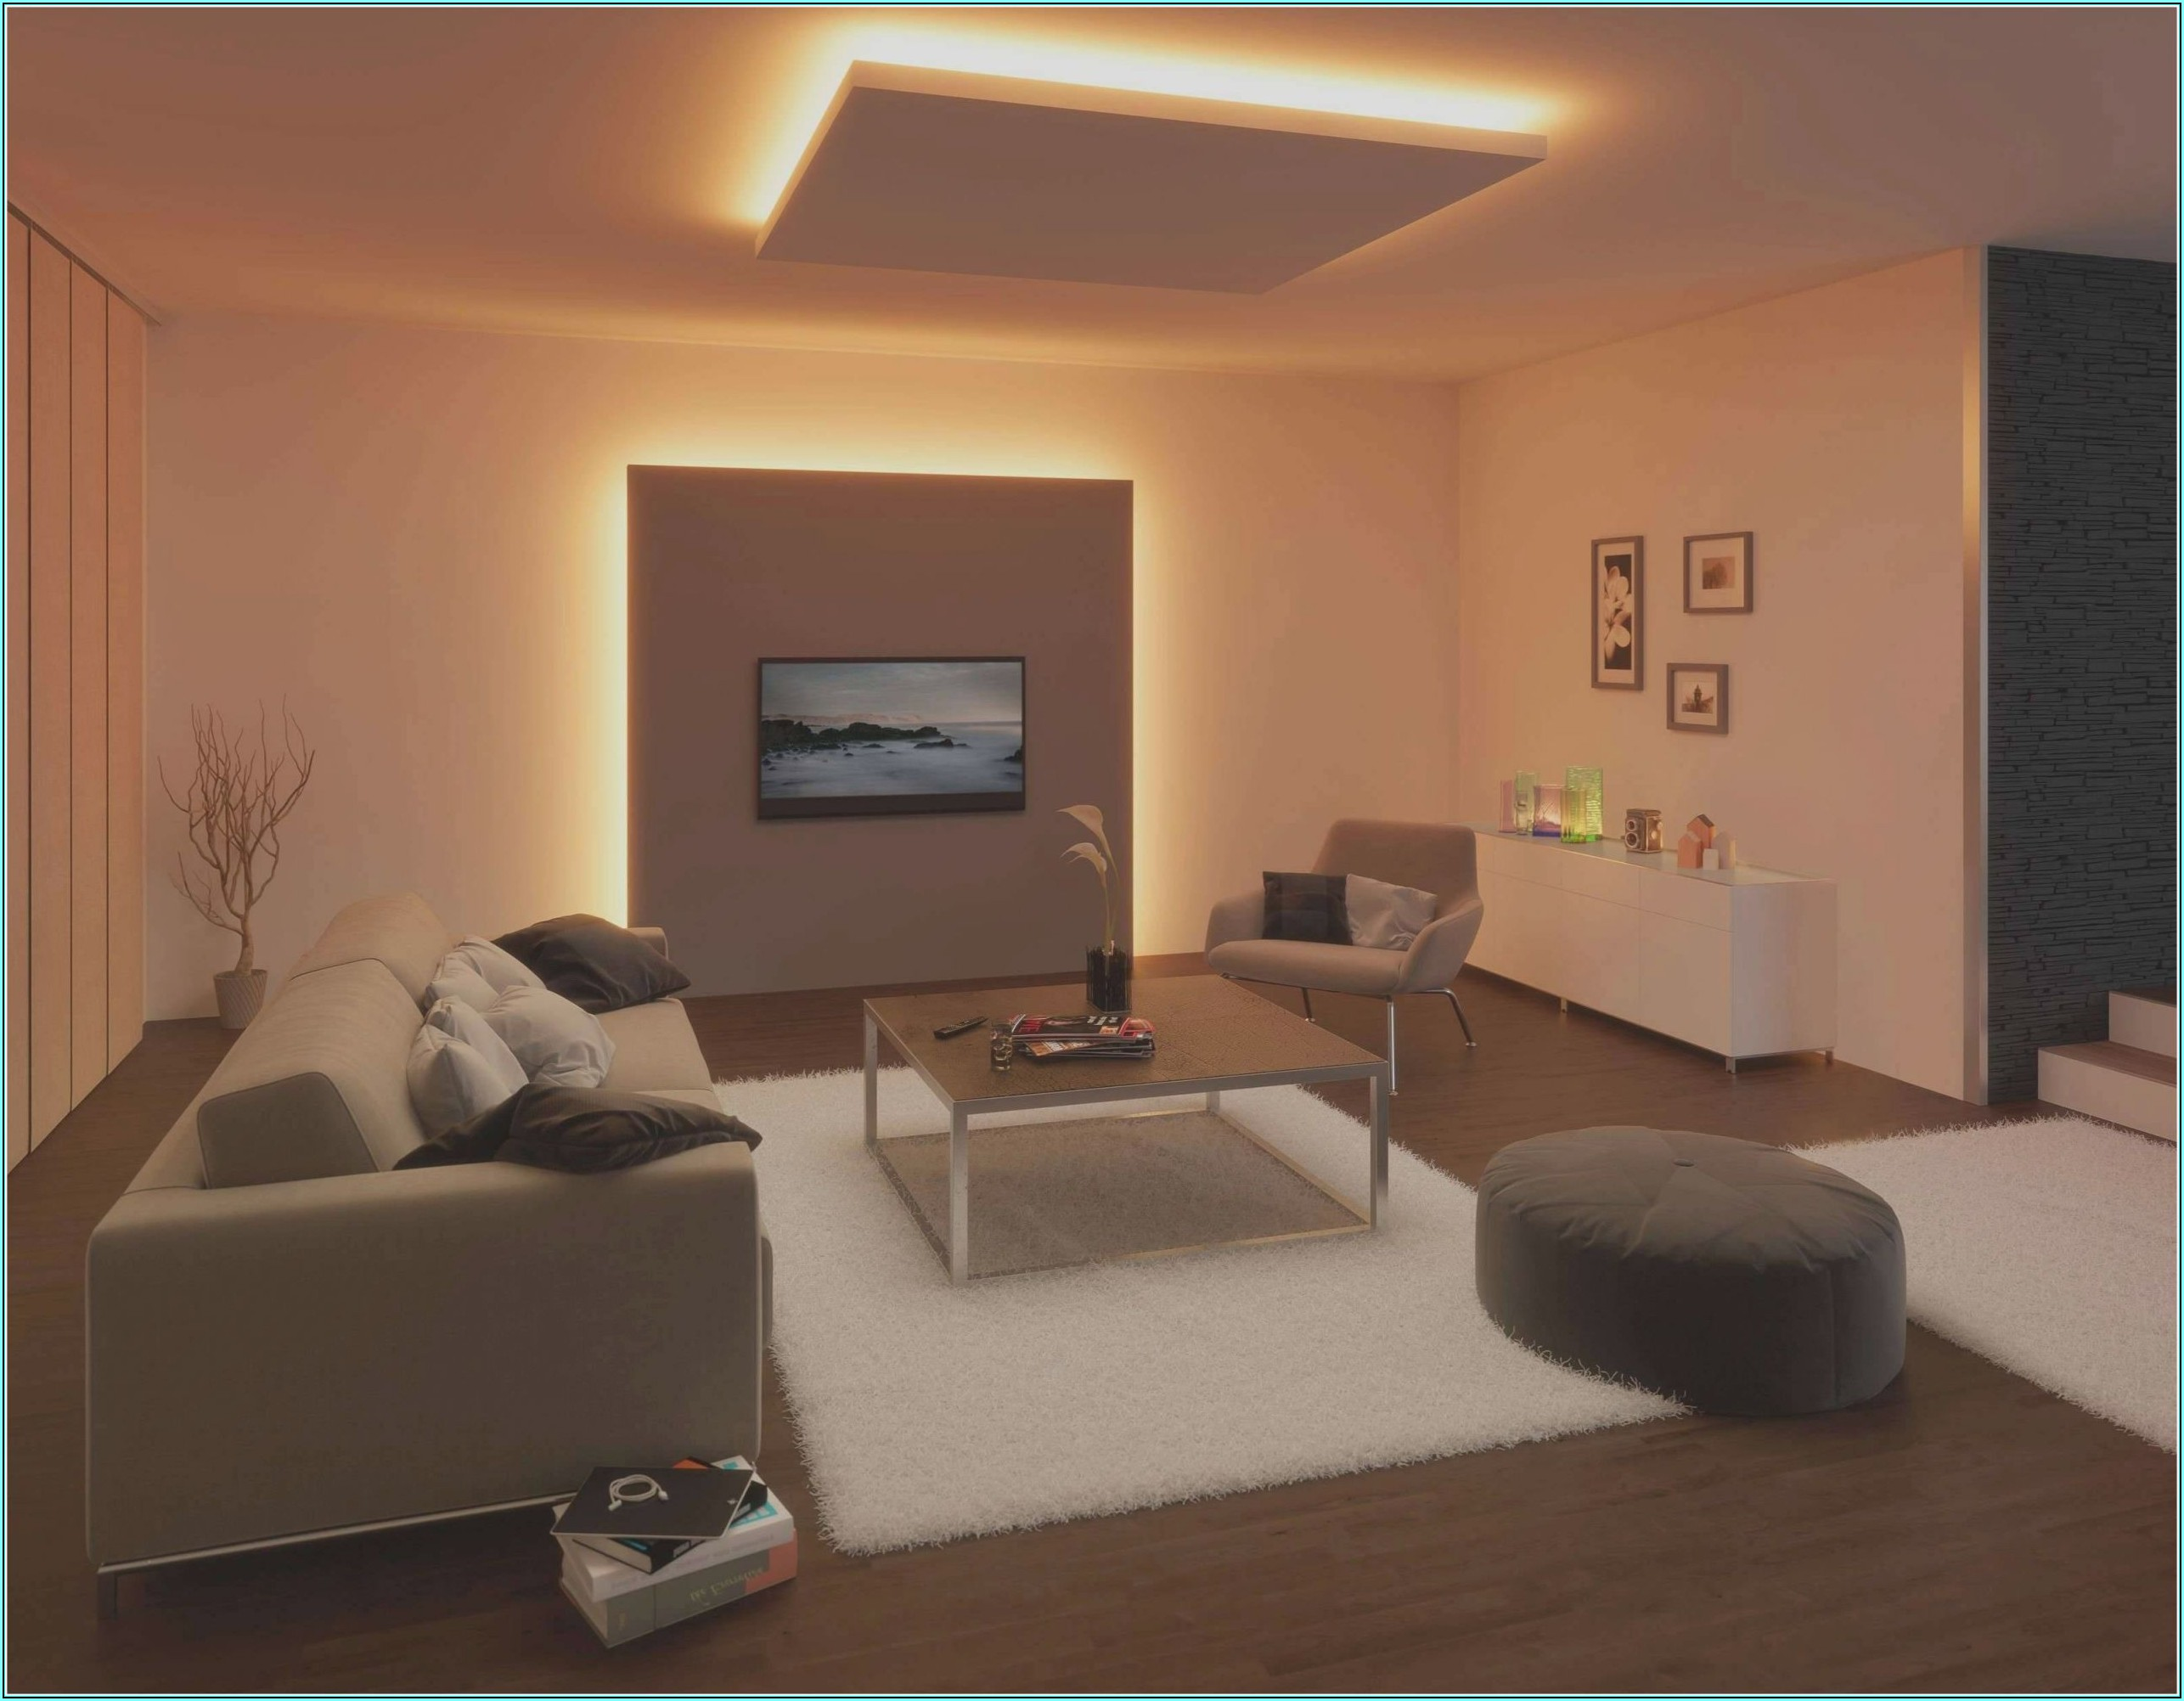 Kreative Wohnzimmer Ideen